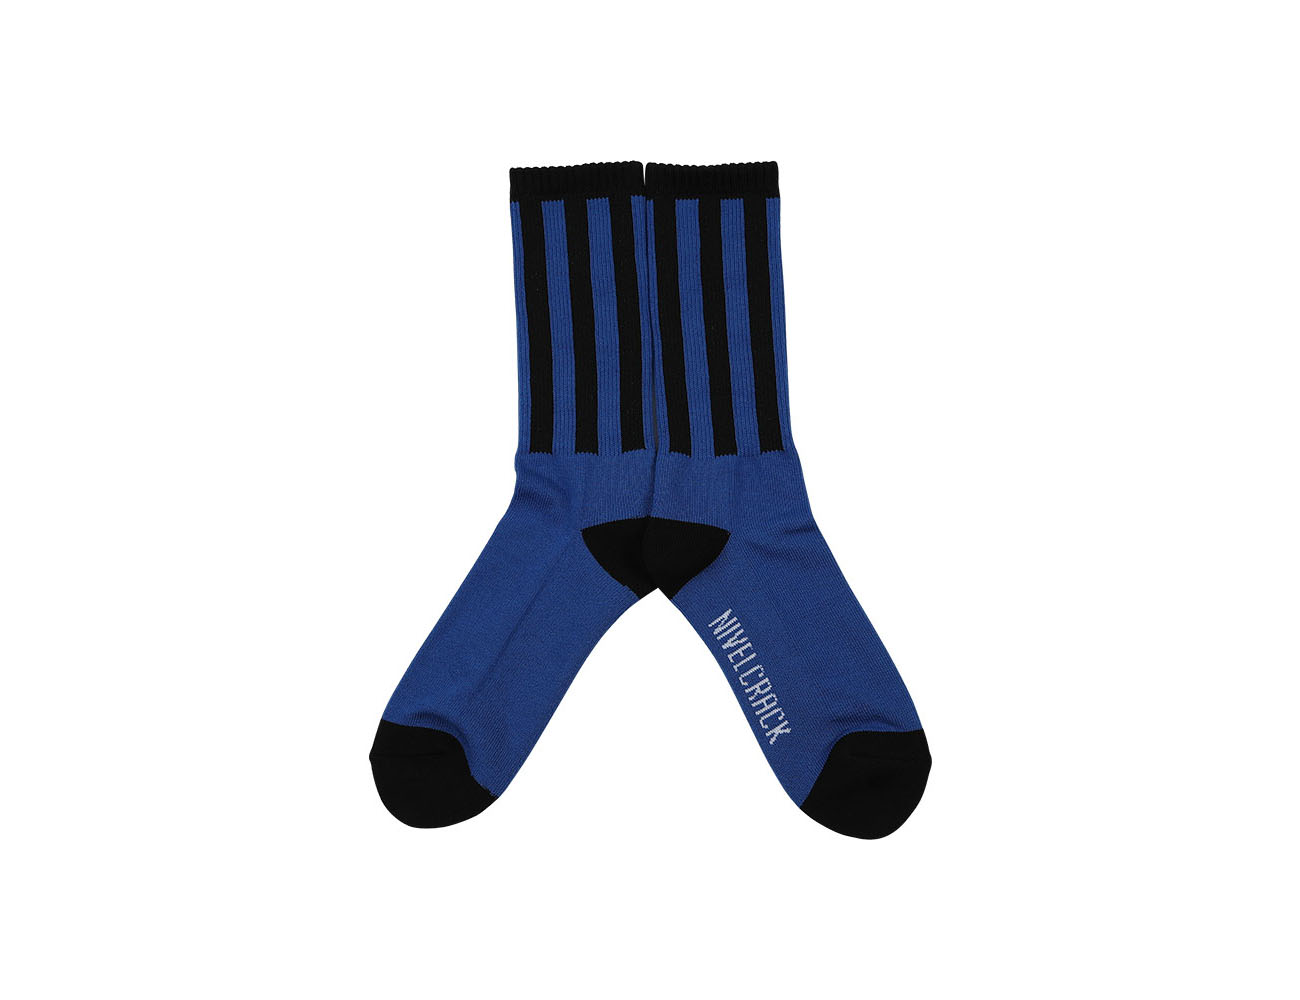 socks_nerazzurri